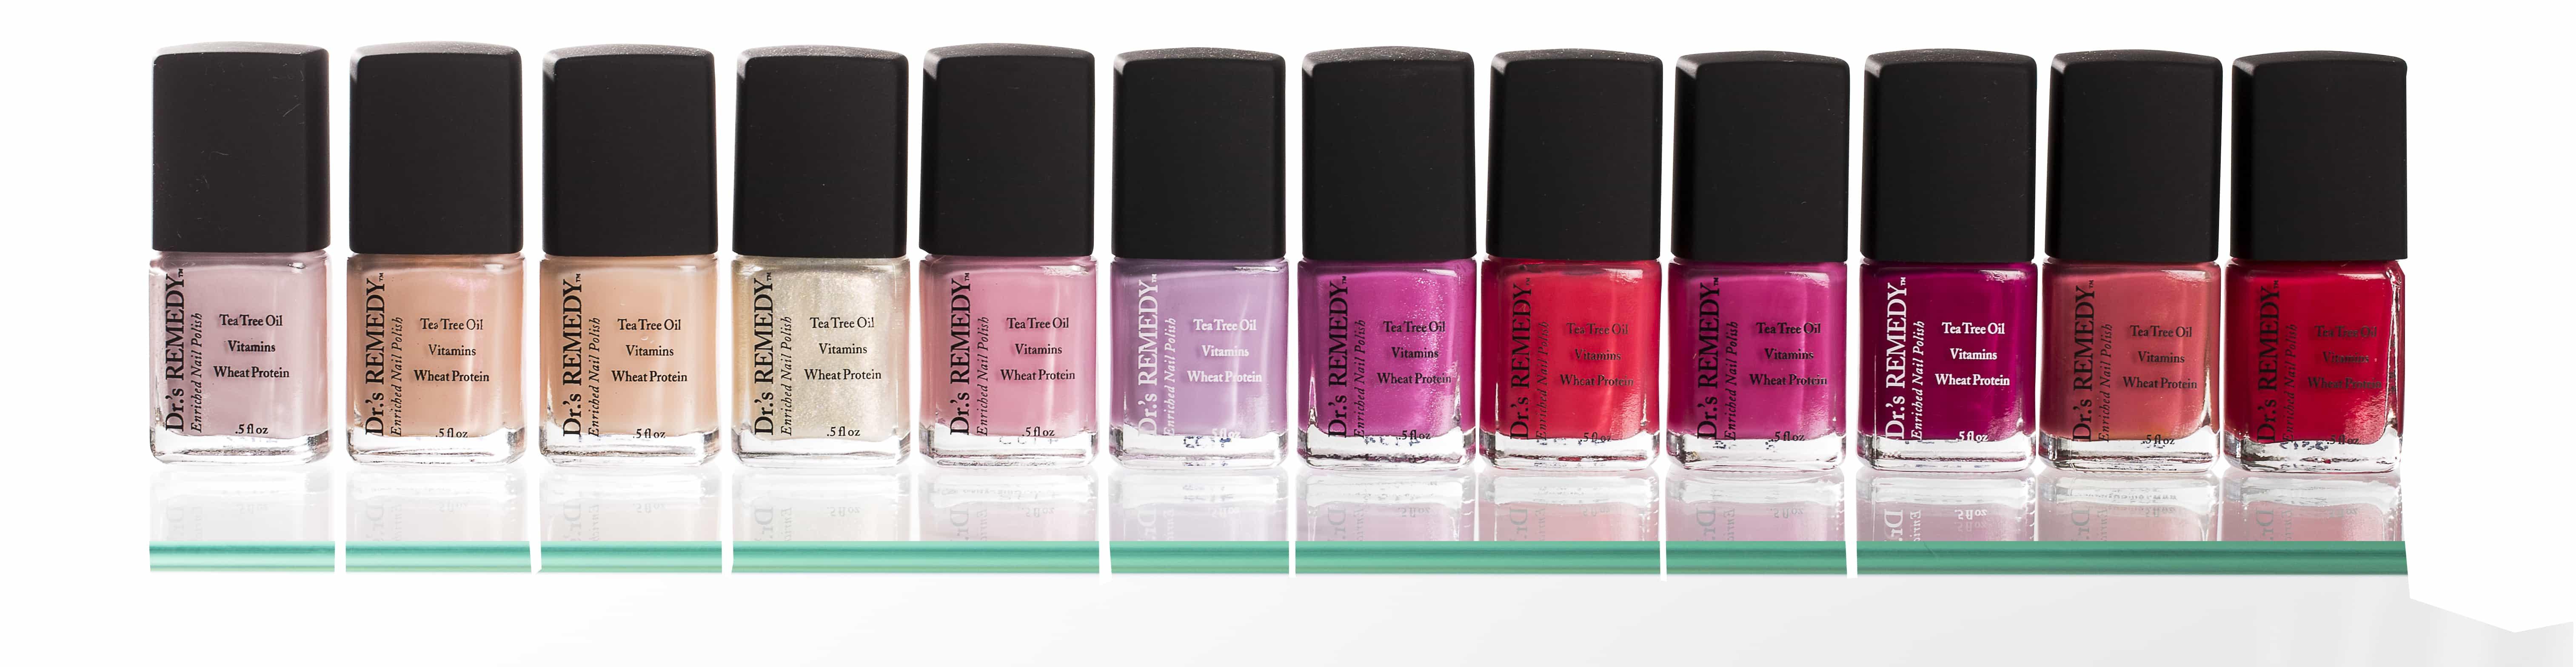 Drs Remedy Nailcare Nail Polish Colours